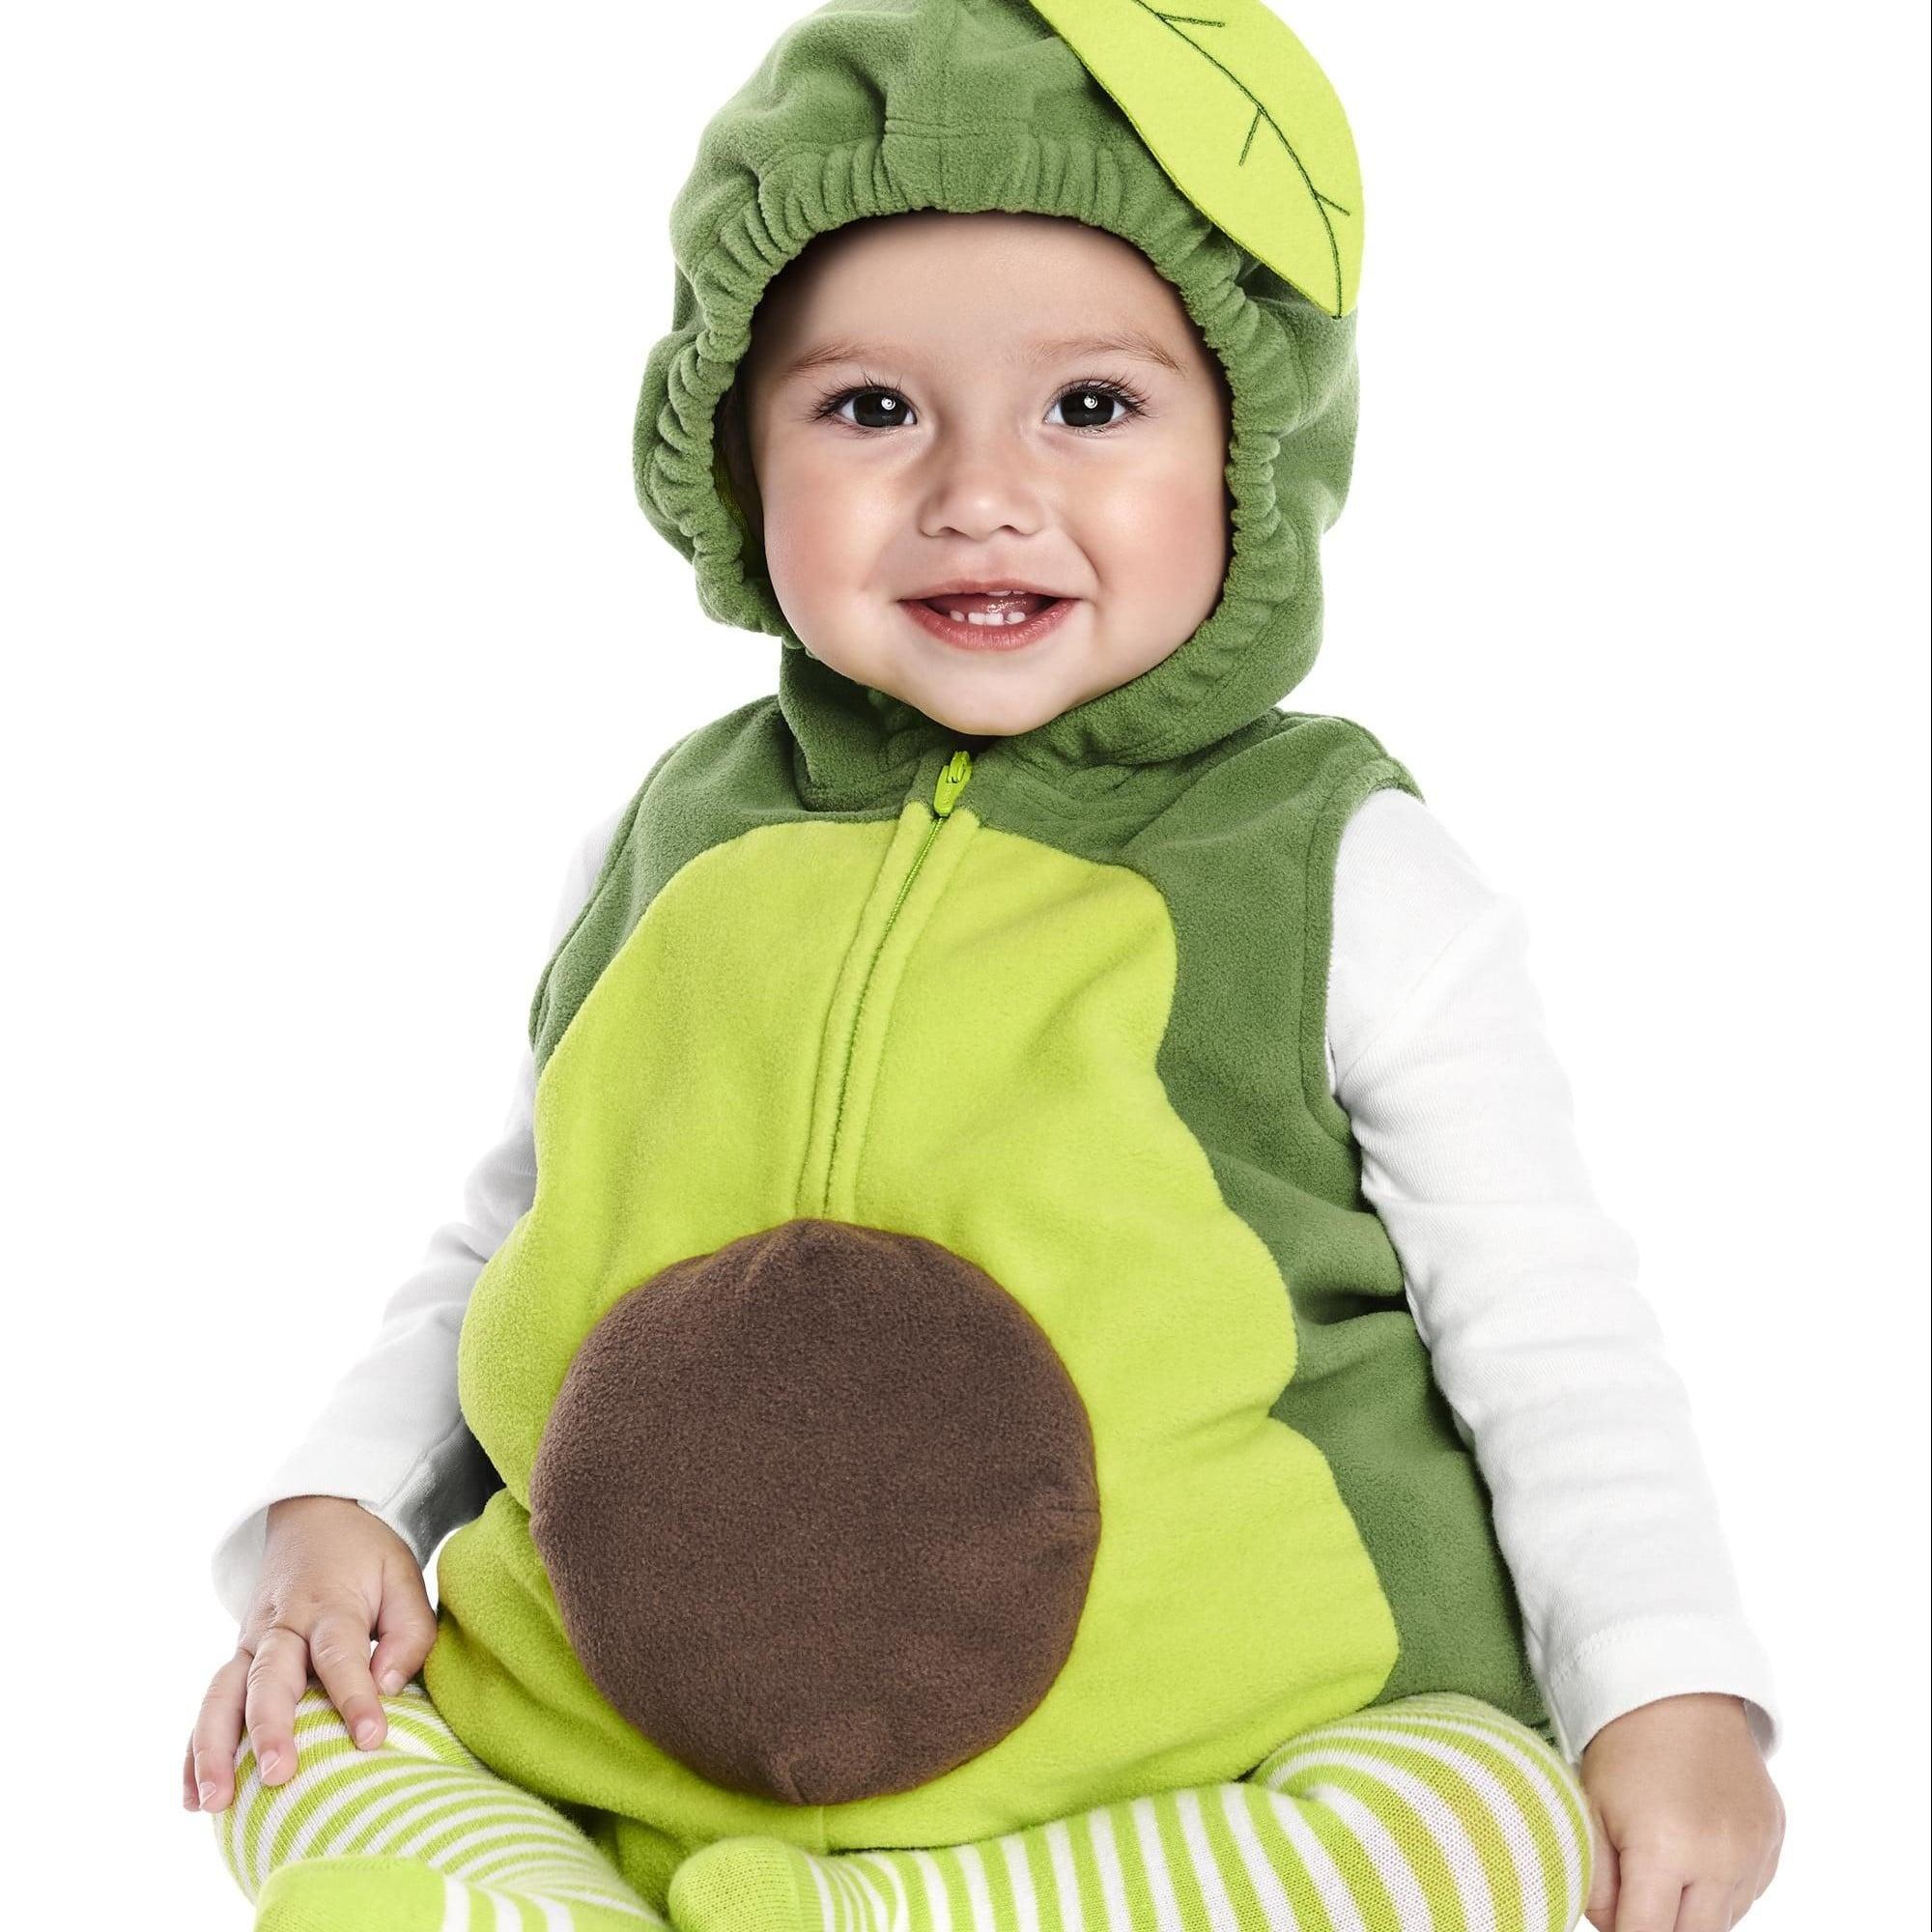 carter's baby halloween costumes | popsugar family photo 17